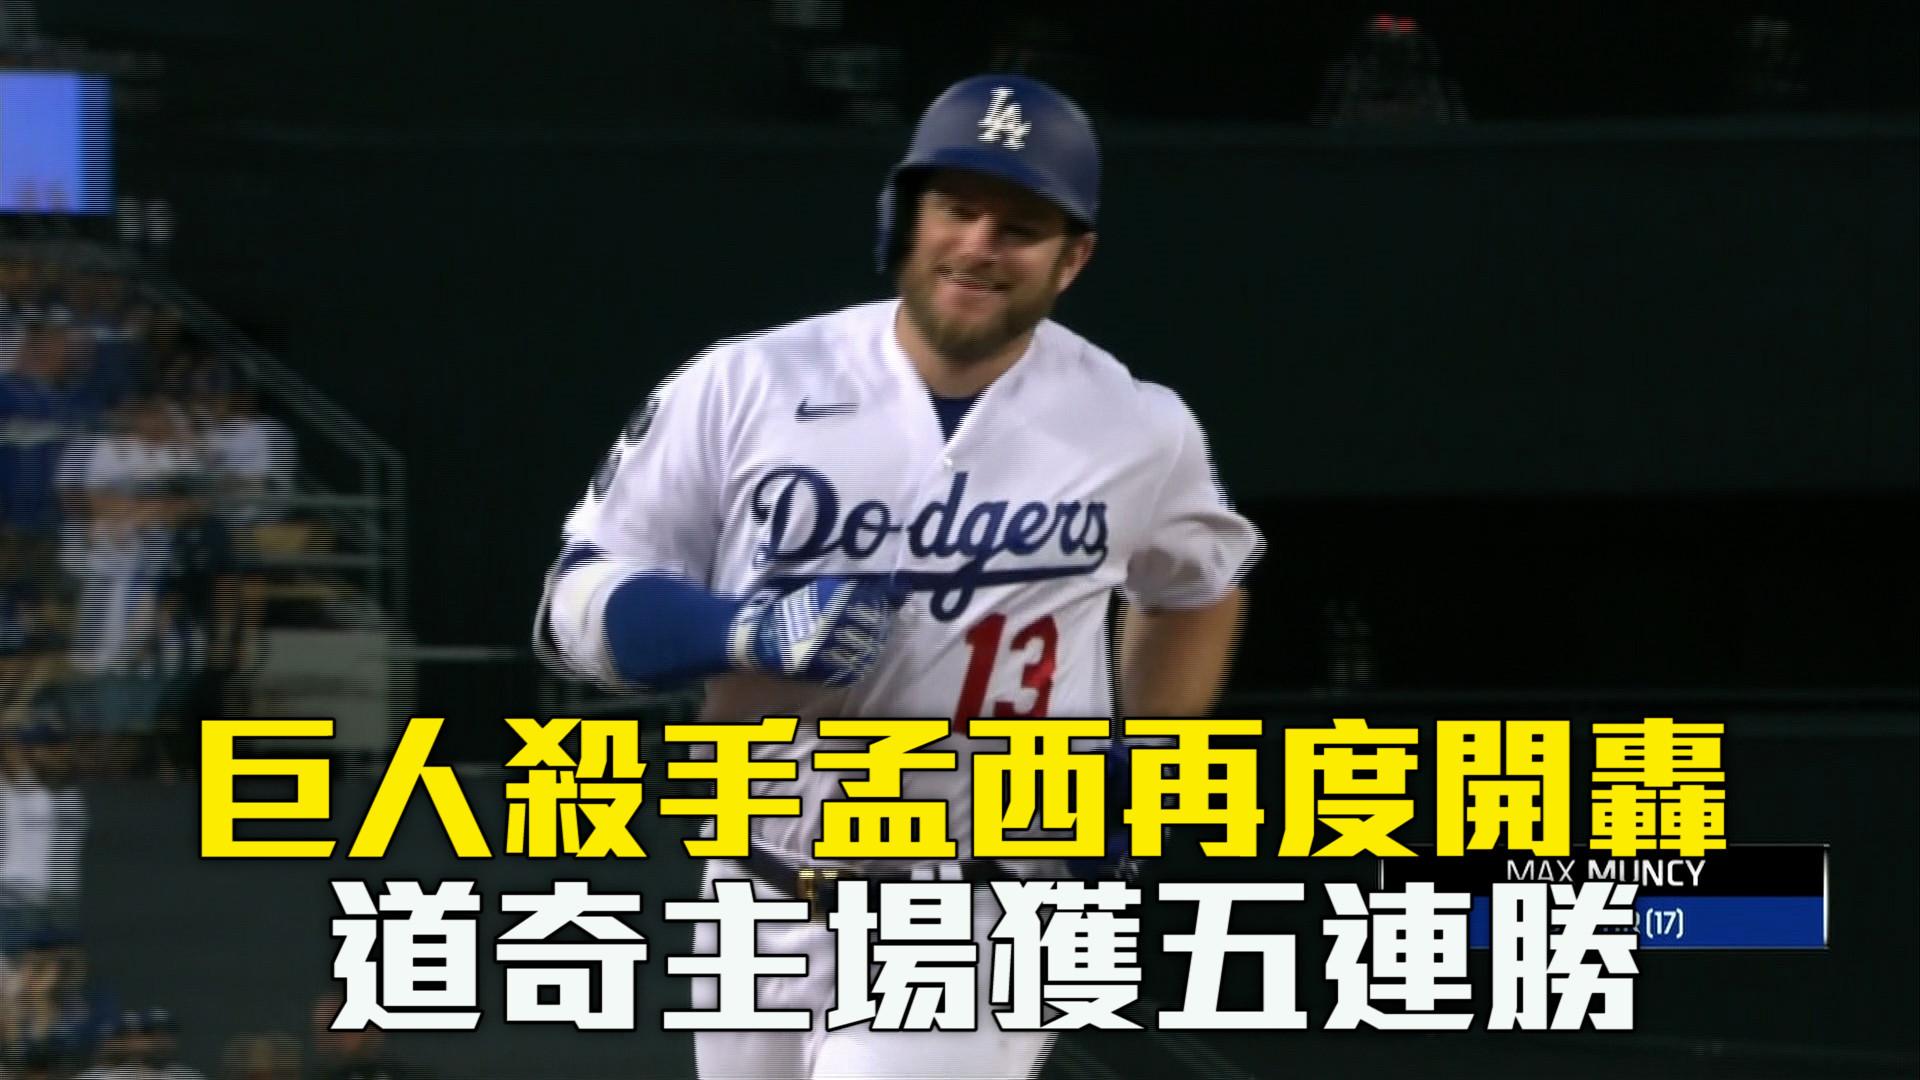 【MLB看愛爾達】國聯西區雙強爭霸 道奇主場再勝巨人 06/30